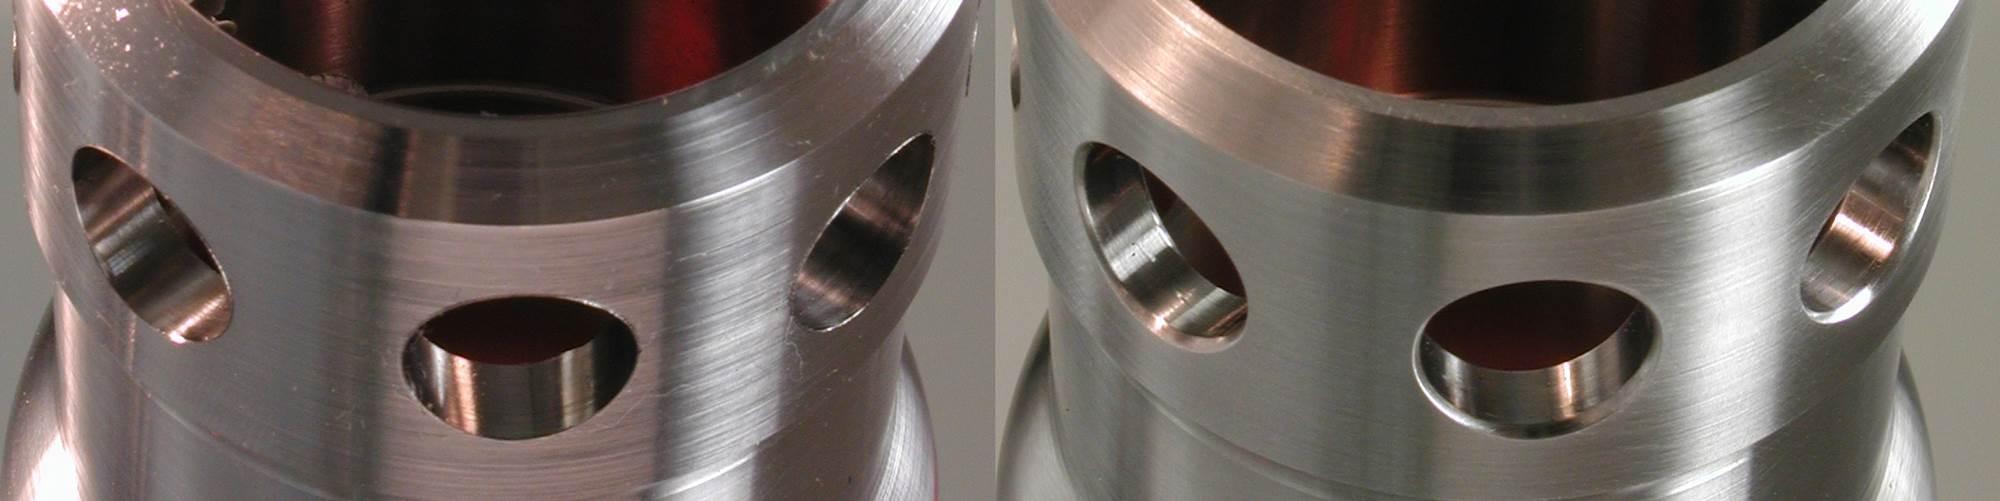 Versatile, Flexible Honing Tool Used for Surface Finishing, Cross Hole Deburring